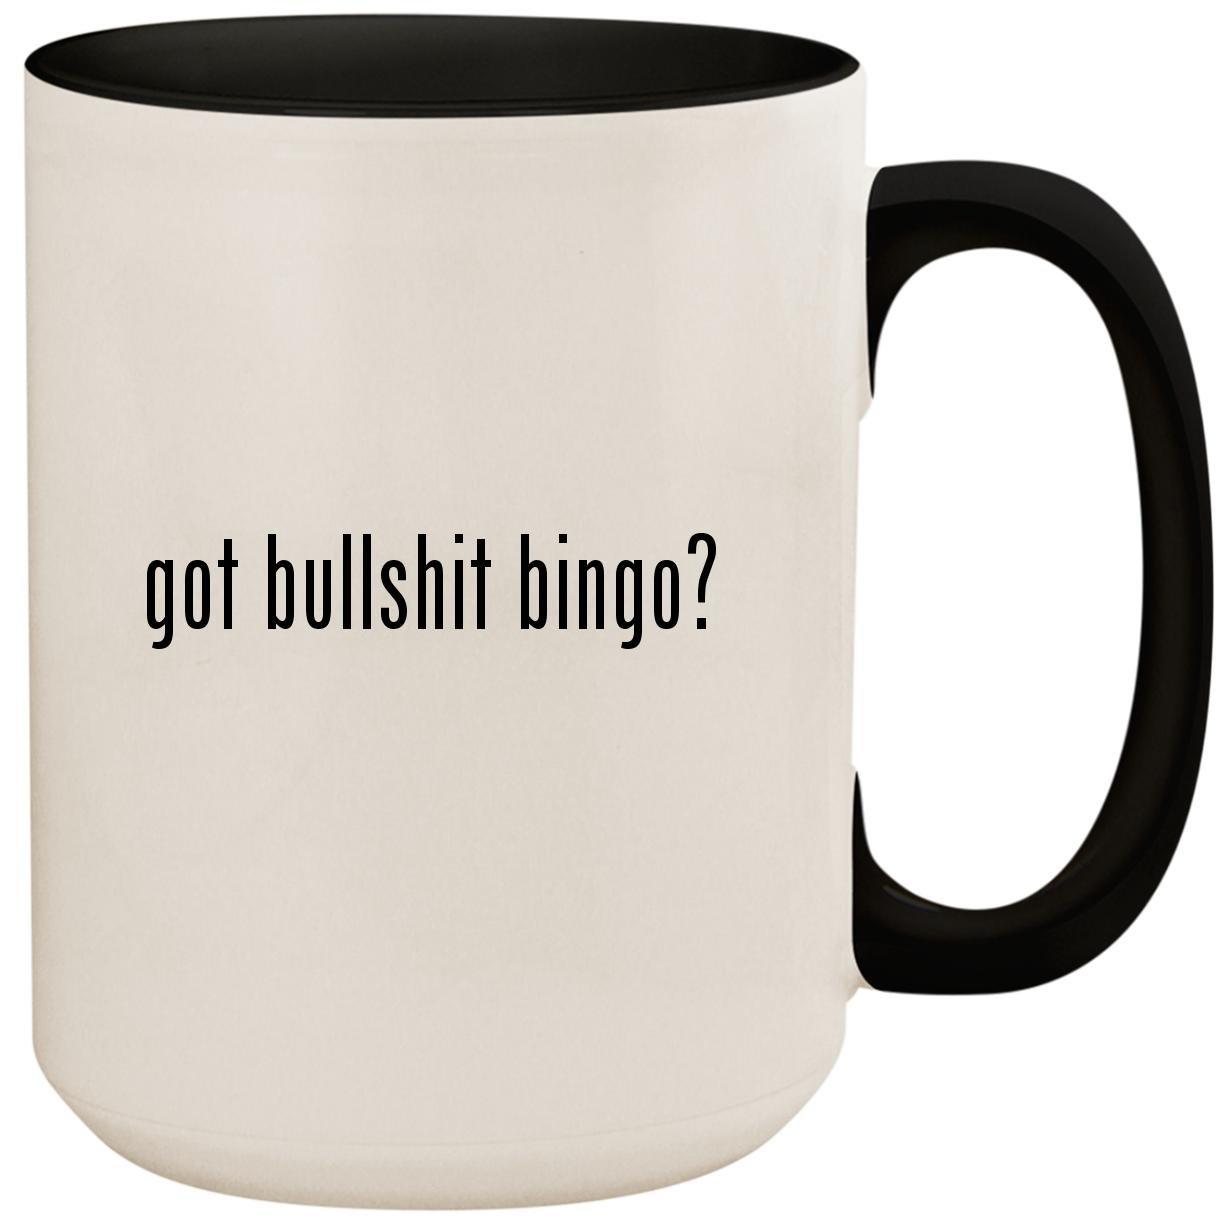 got bullshit bingo? - 15oz Ceramic Colored Inside and Handle Coffee Mug Cup, Black